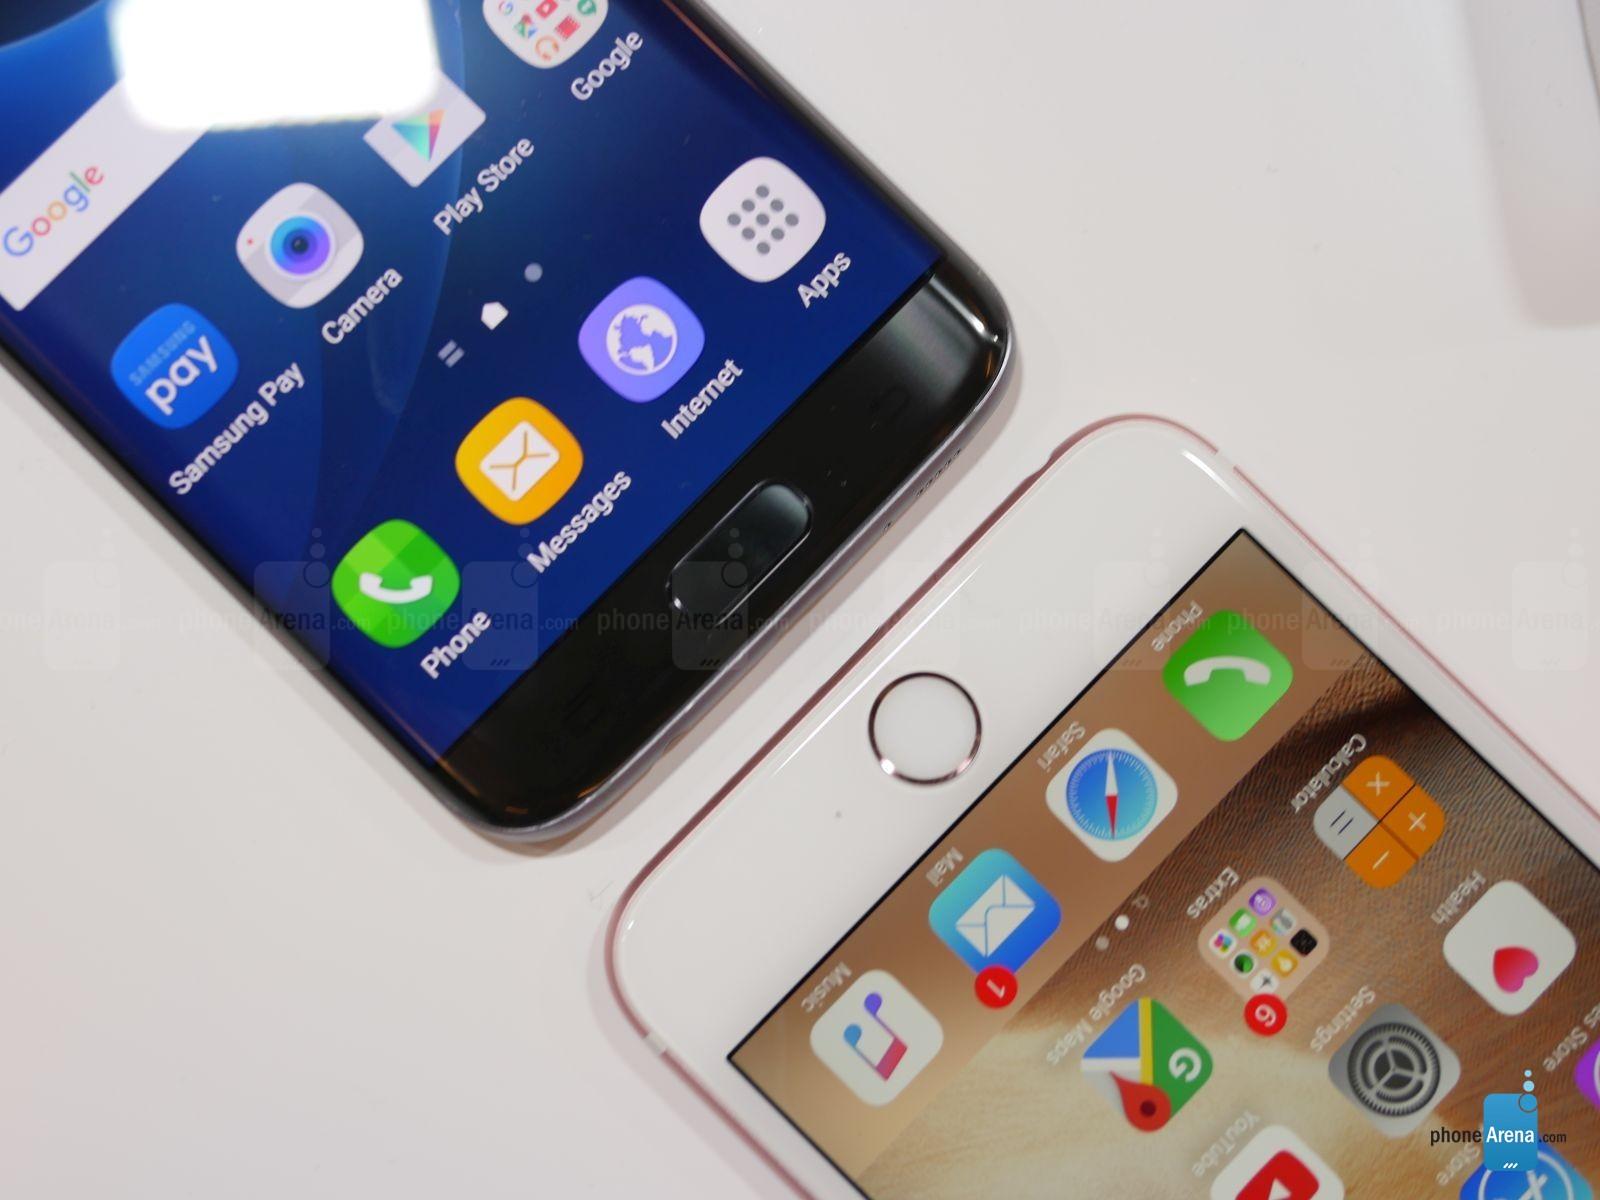 Samsung-Galaxy-S7-edgььттиe-vs-Apple-iPhone-6s-Plus